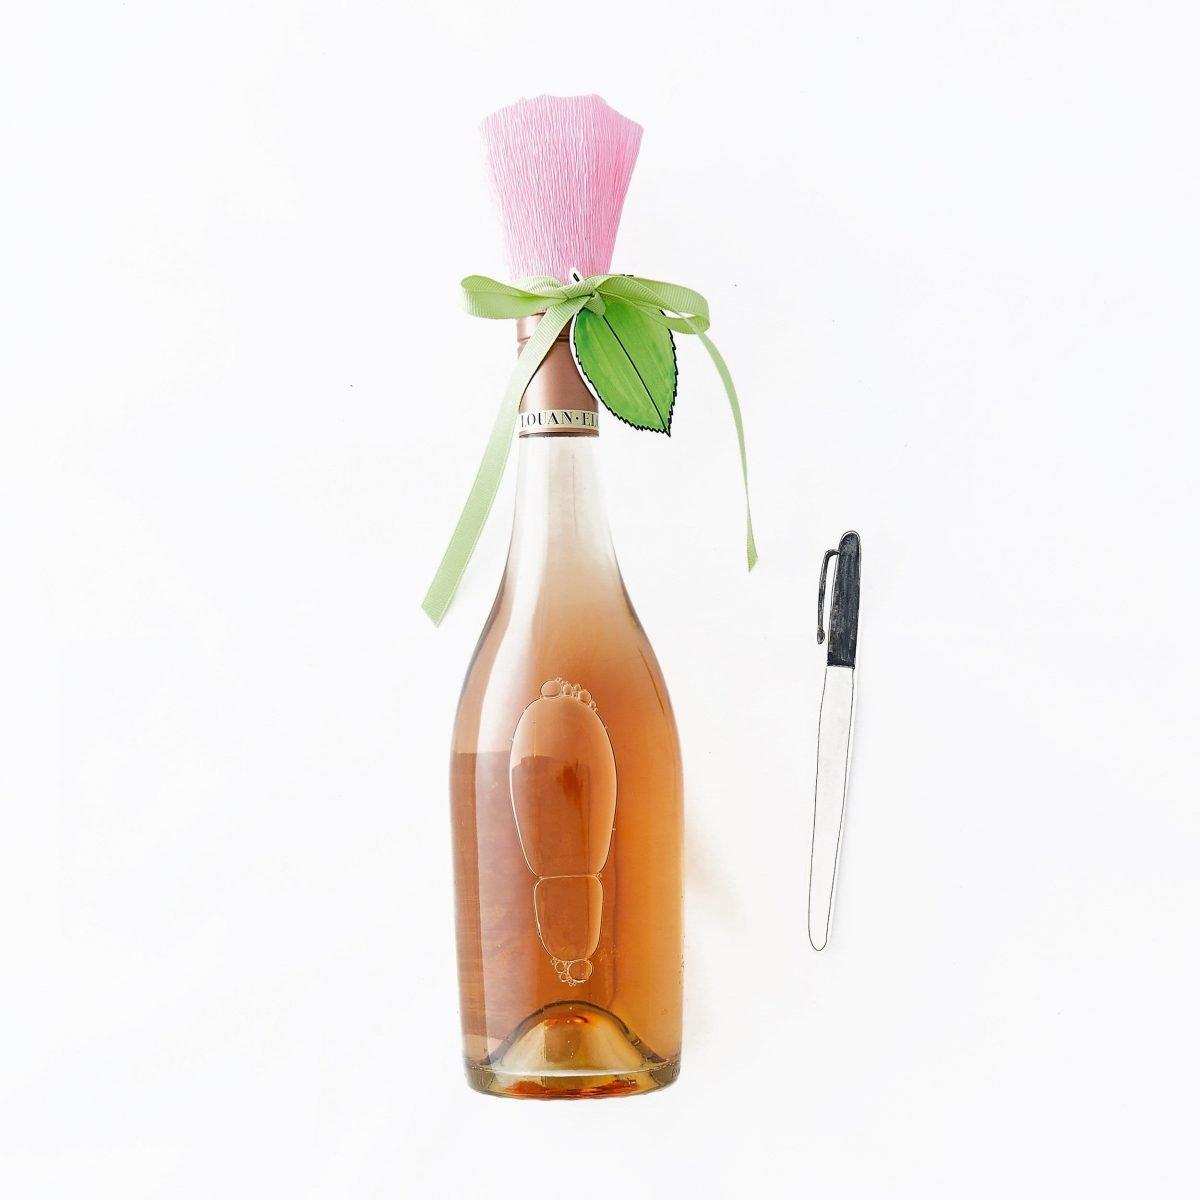 Darcy Miller, Darcy Miller Designs, Mother's Day, bridal shower, baby shower, galentines, girl's night, paper flower, flower craft. Paper craft, downloadable template, wine bottle, Elouan